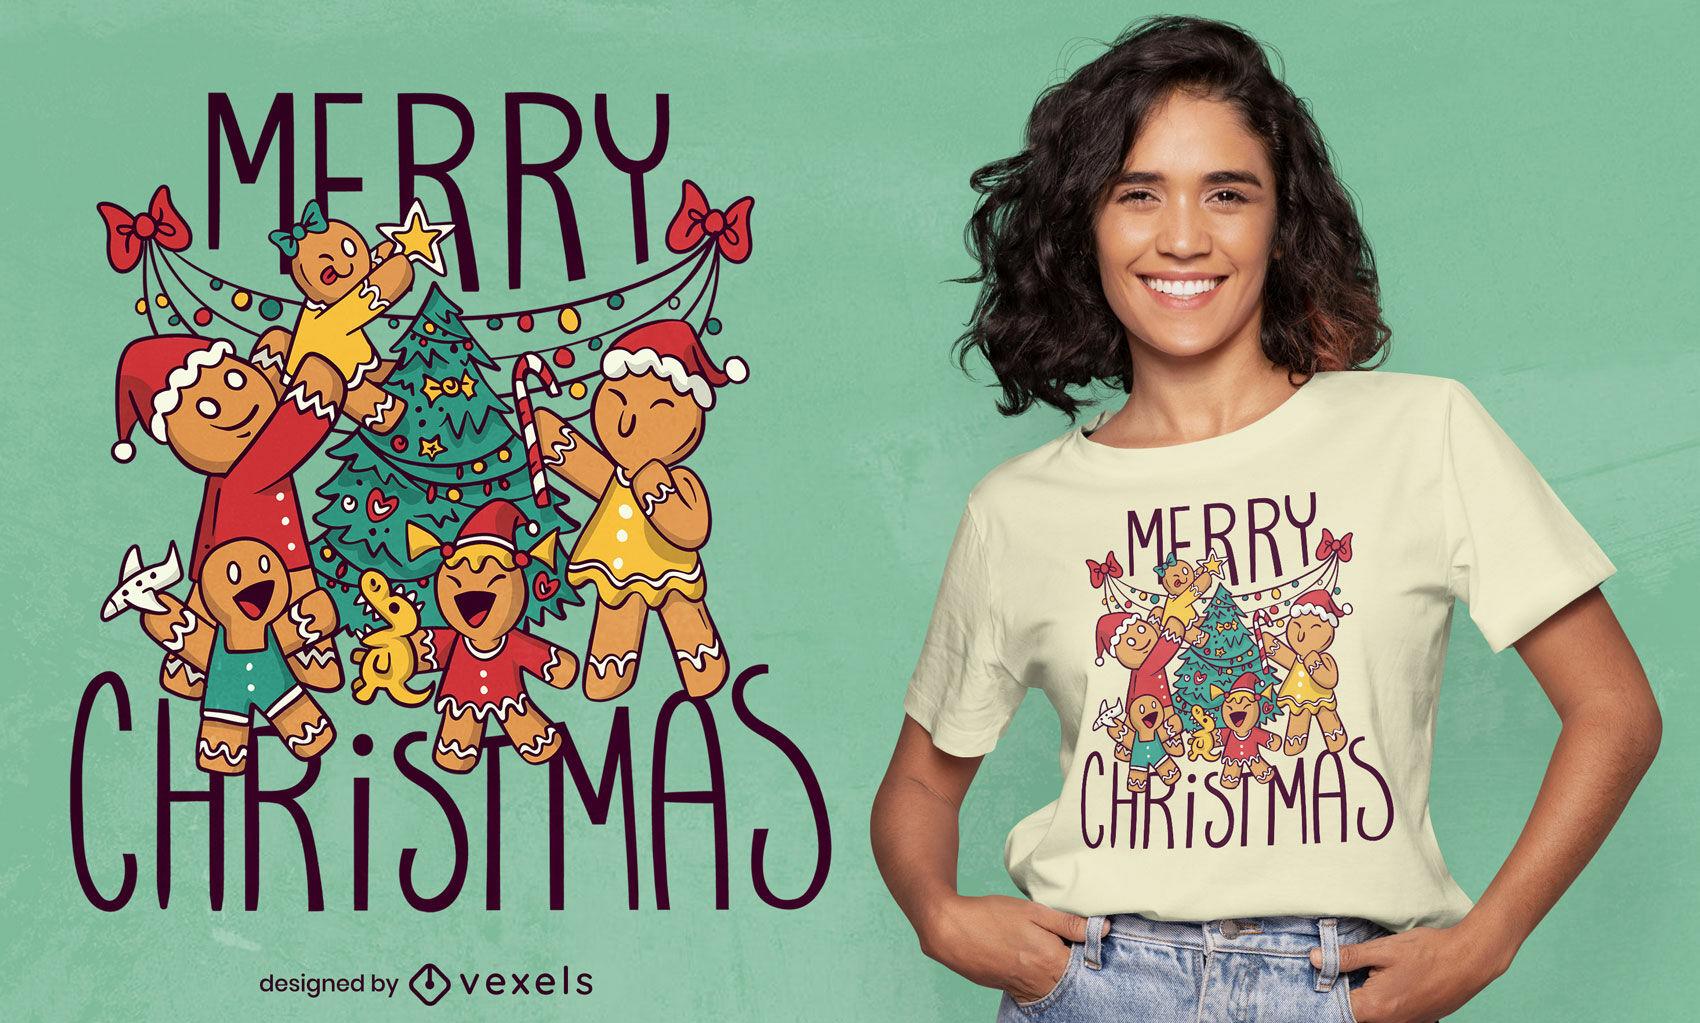 Gingerbread cookies christmas t-shirt design